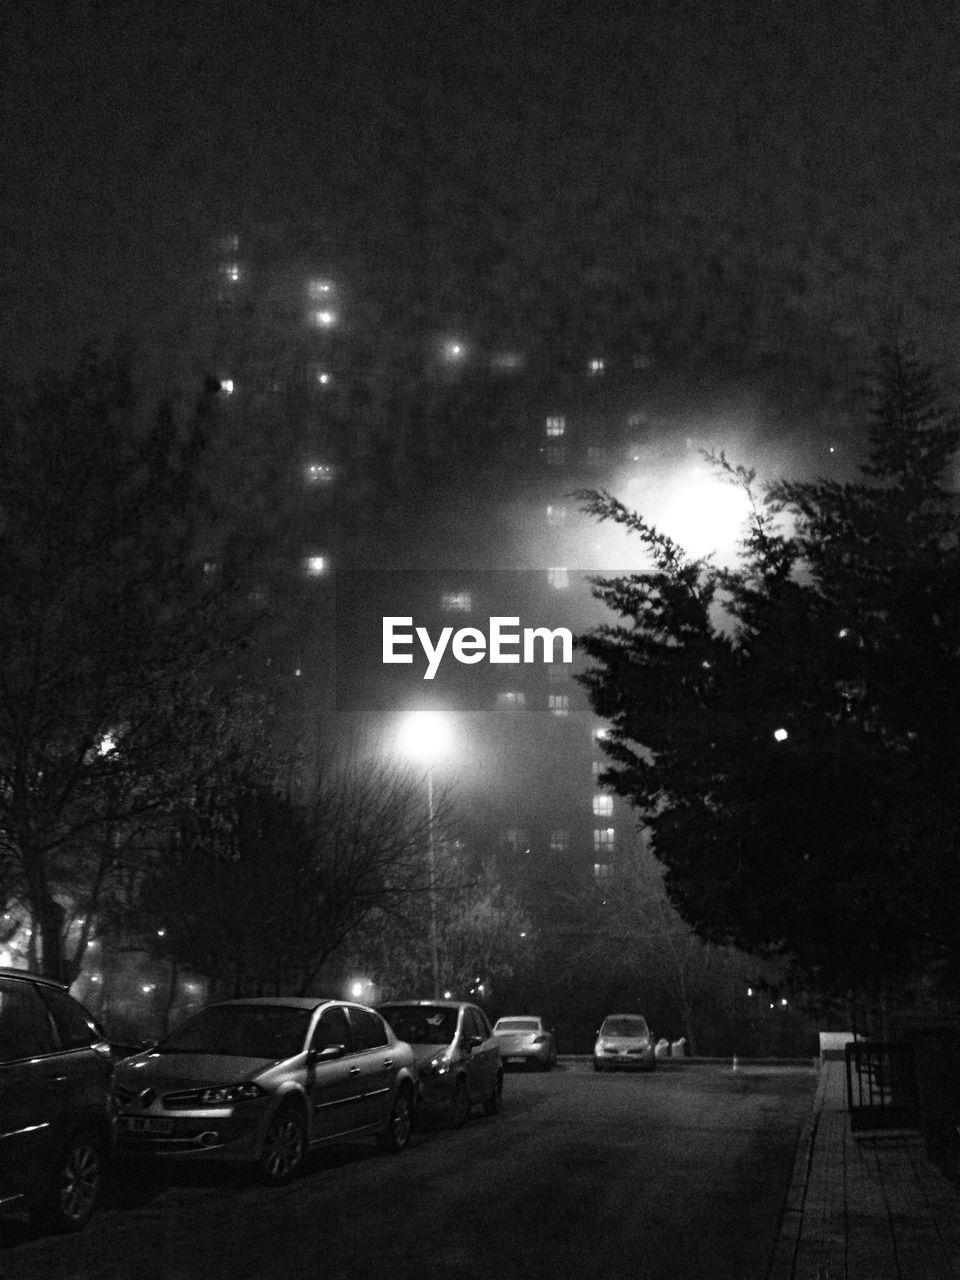 night, illuminated, car, tree, land vehicle, transportation, street light, outdoors, sky, no people, city